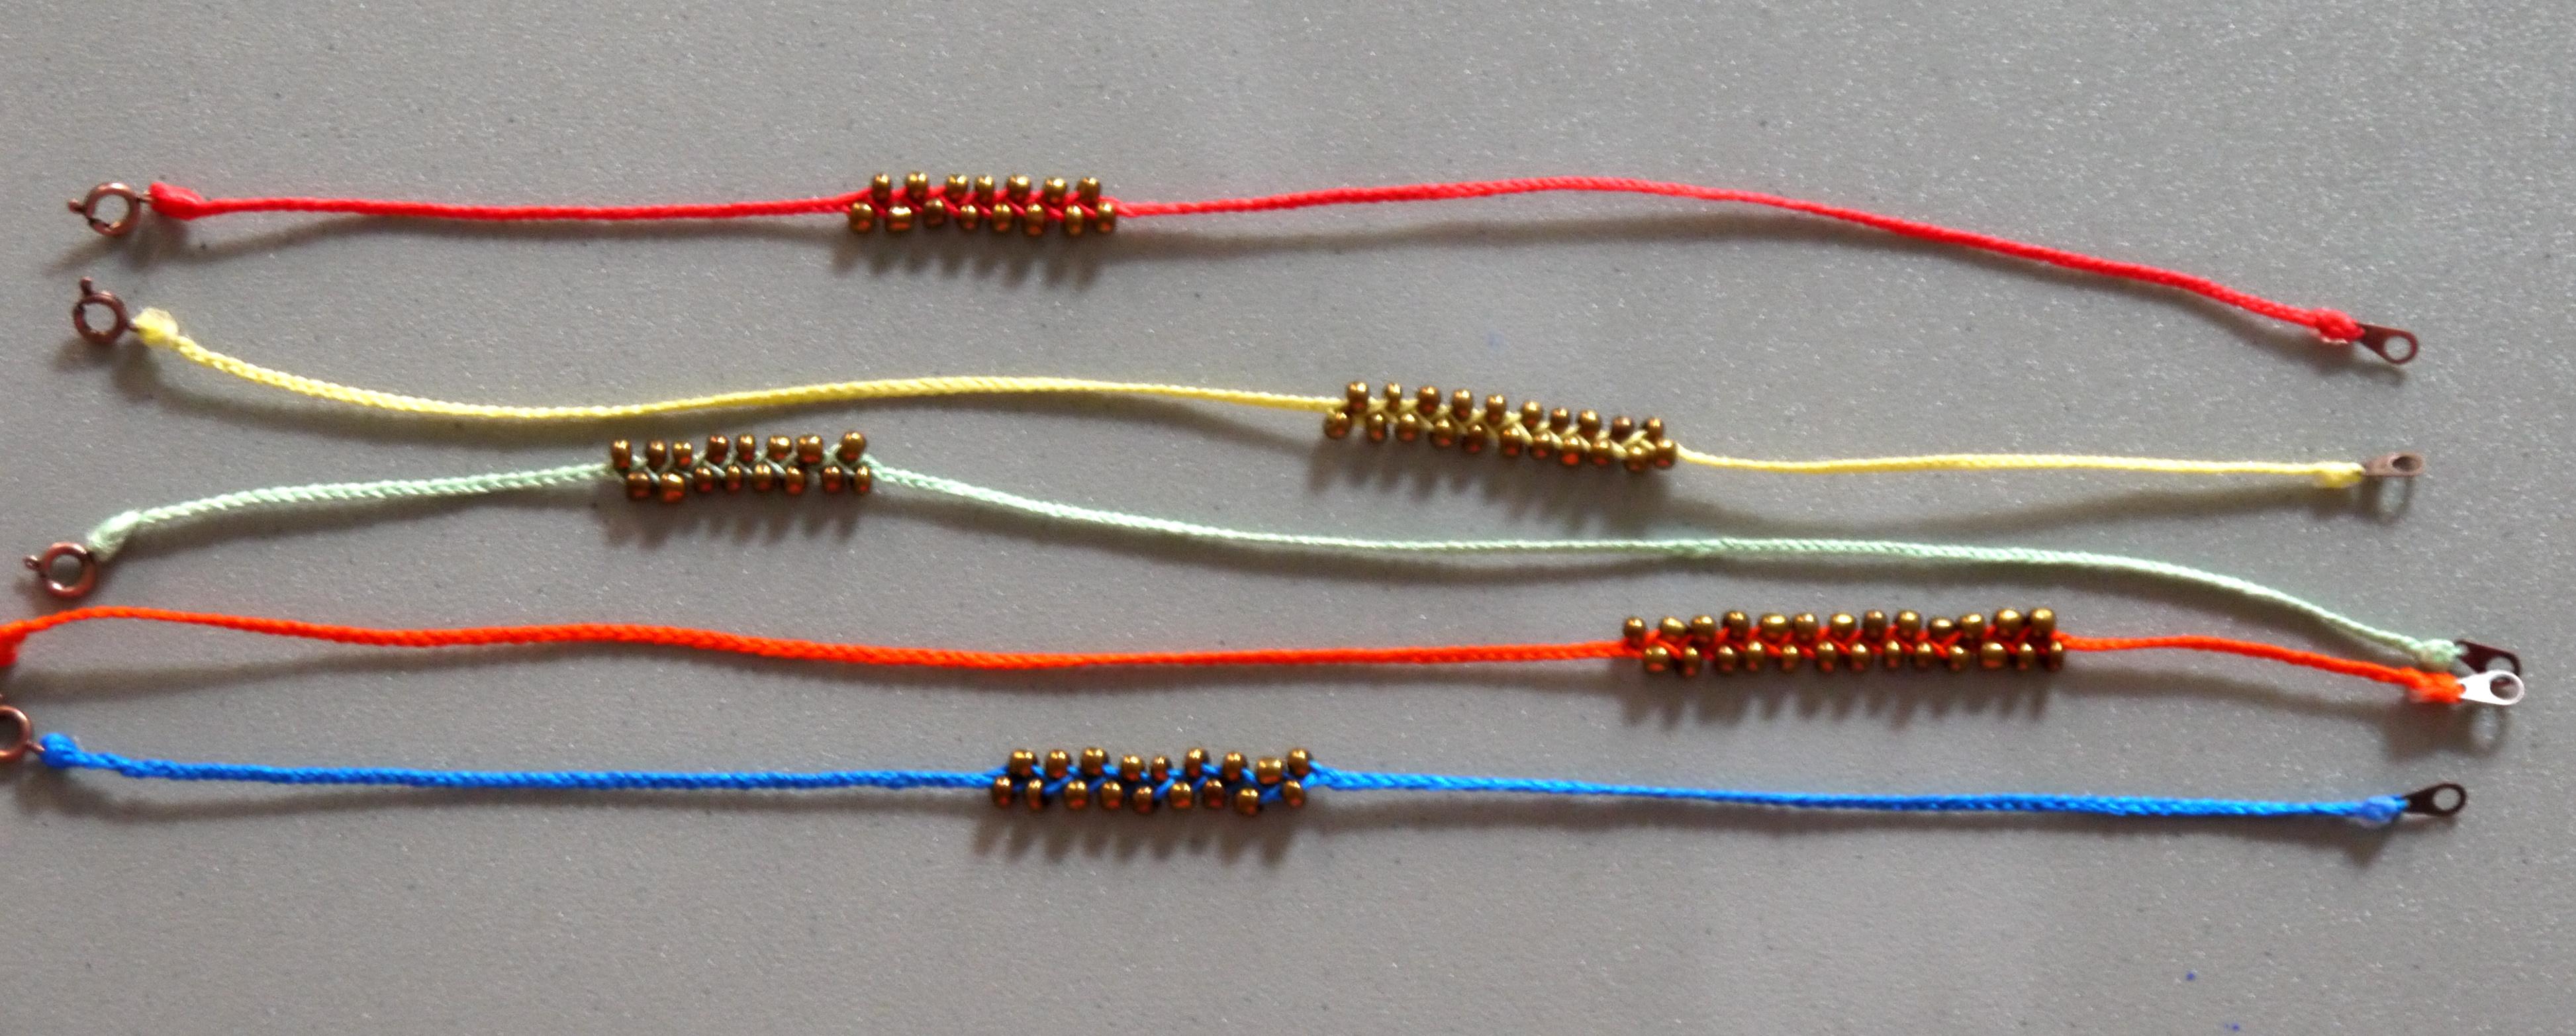 diy neon braided bead bracelets pumps iron. Black Bedroom Furniture Sets. Home Design Ideas